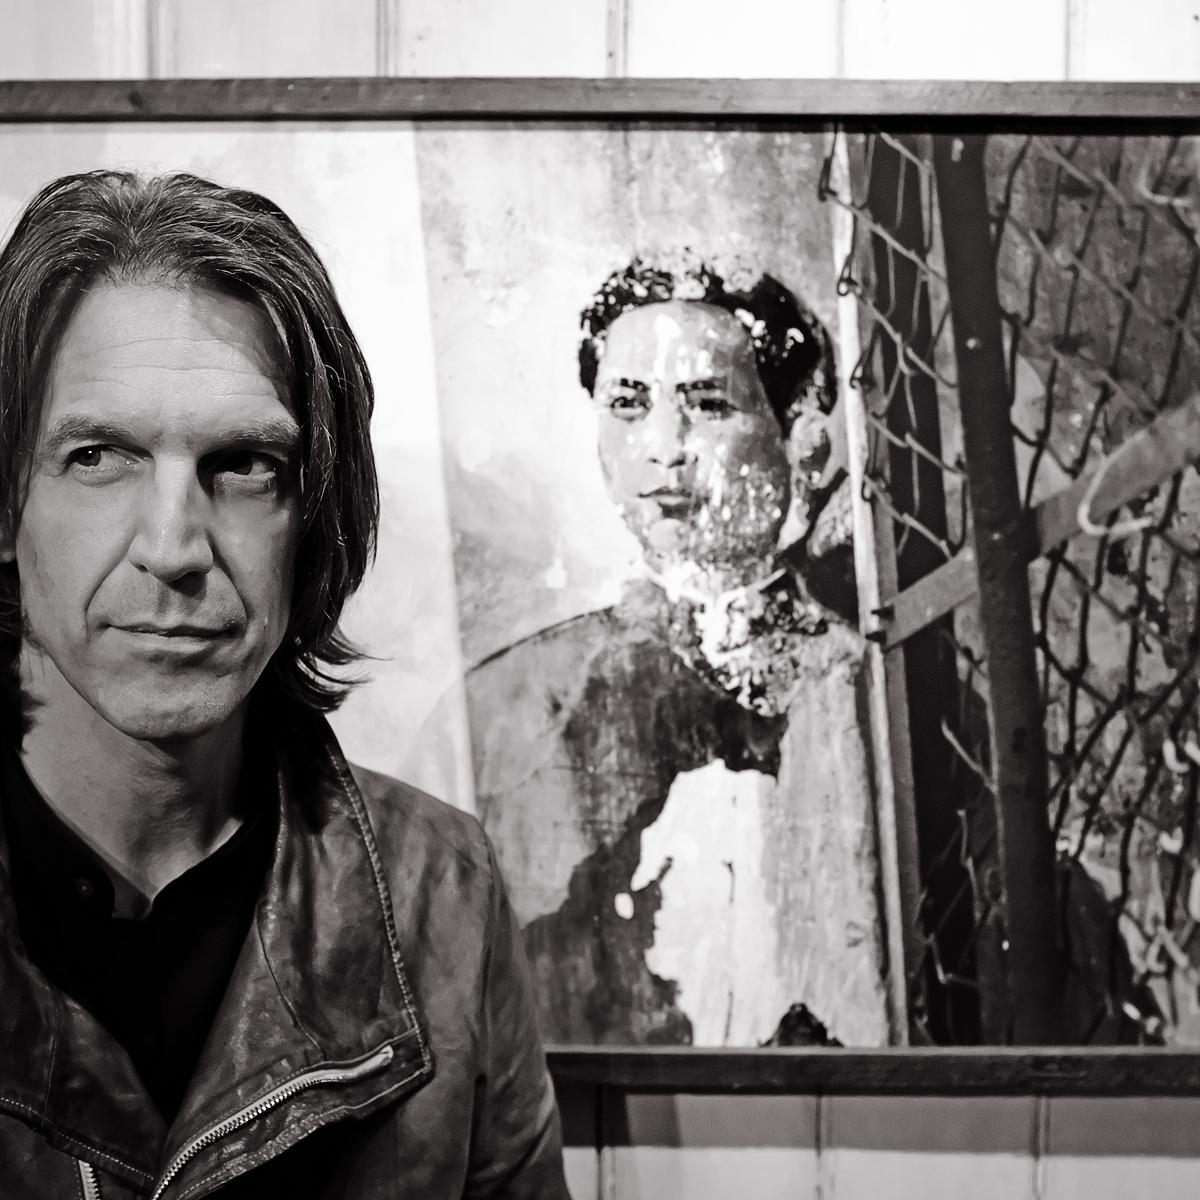 Portrait of Graham Fink, Artist & Creative by Julian Hanford